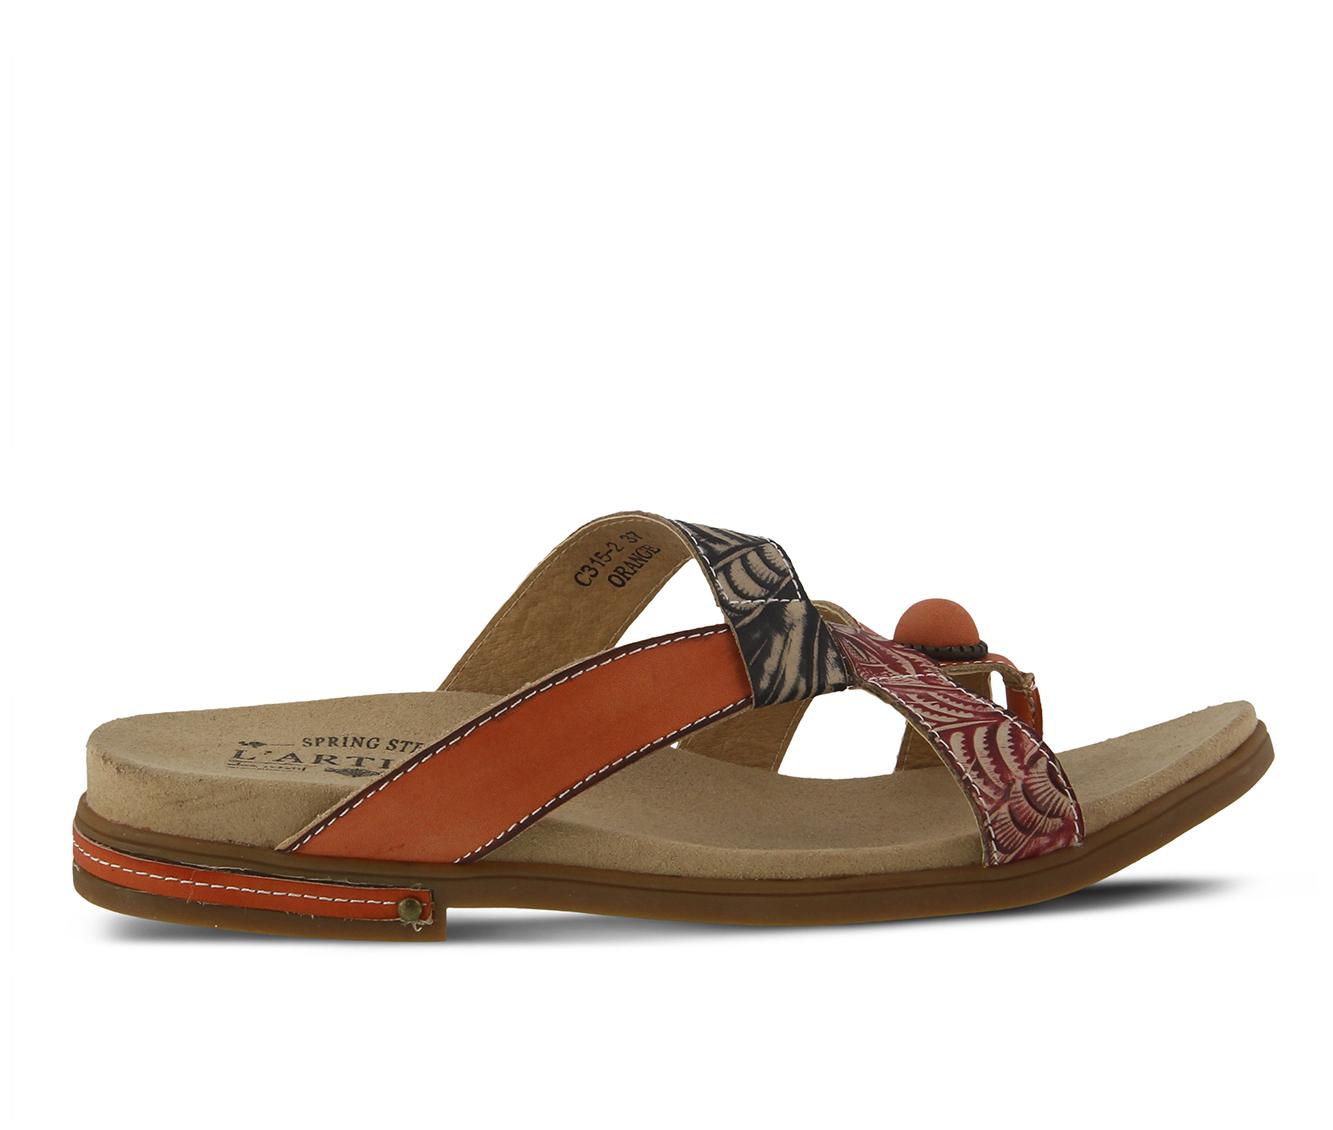 L'Artiste Pierce Women's Sandal (Pink Leather)